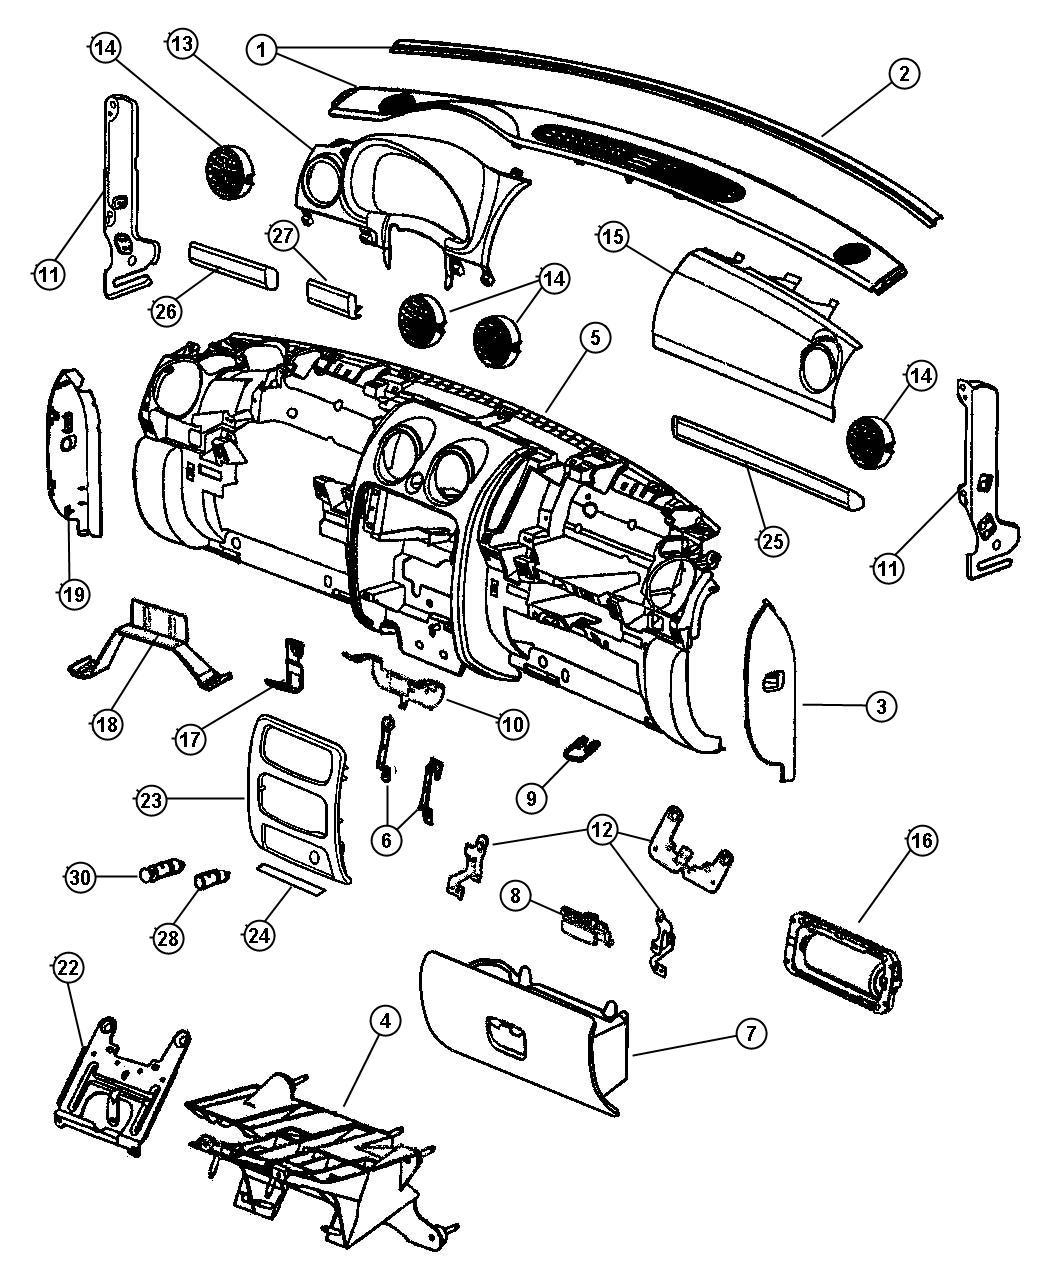 Jeep Liberty Panel. Knee blocker. Trim: [all trim codes